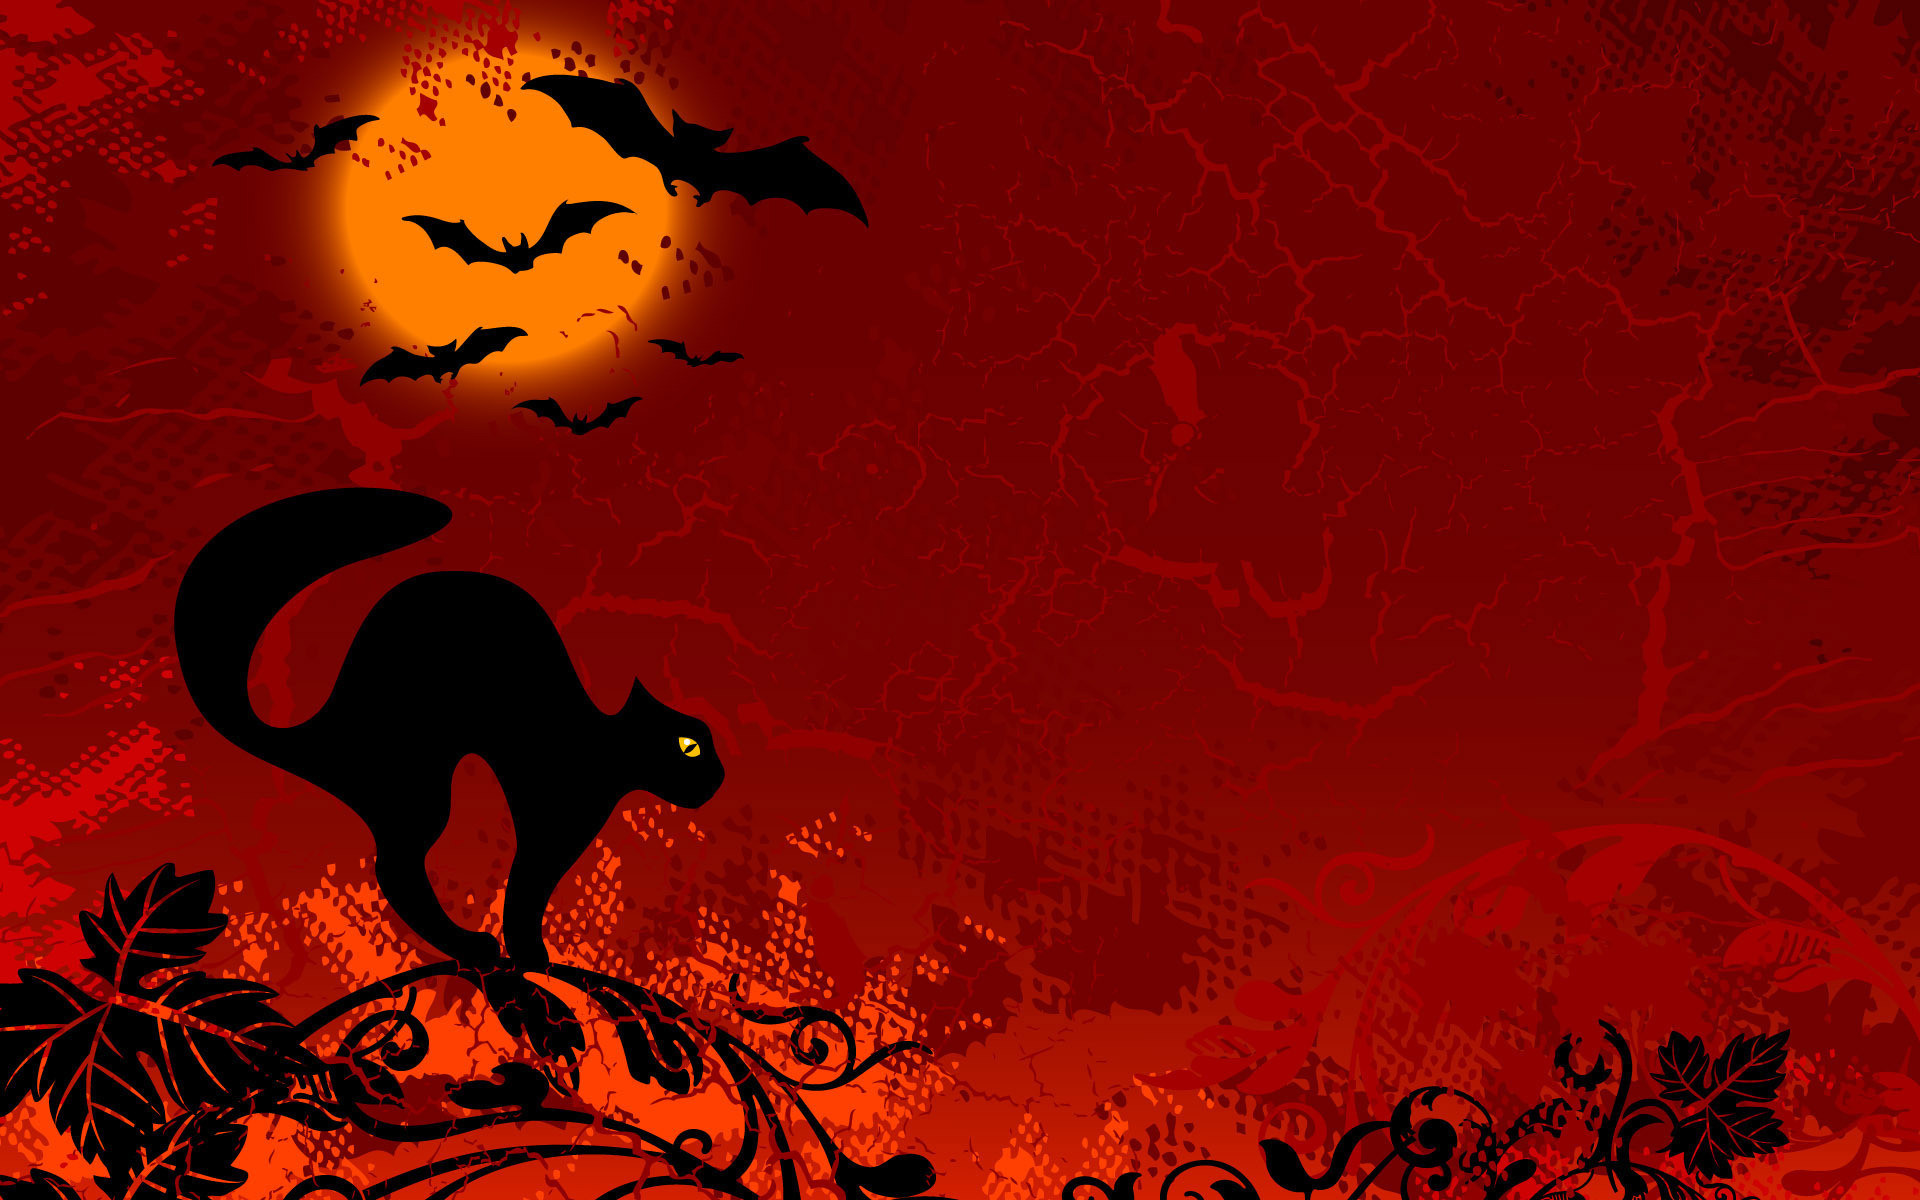 54 Bat HD Wallpapers | Backgrounds – Wallpaper Abyss